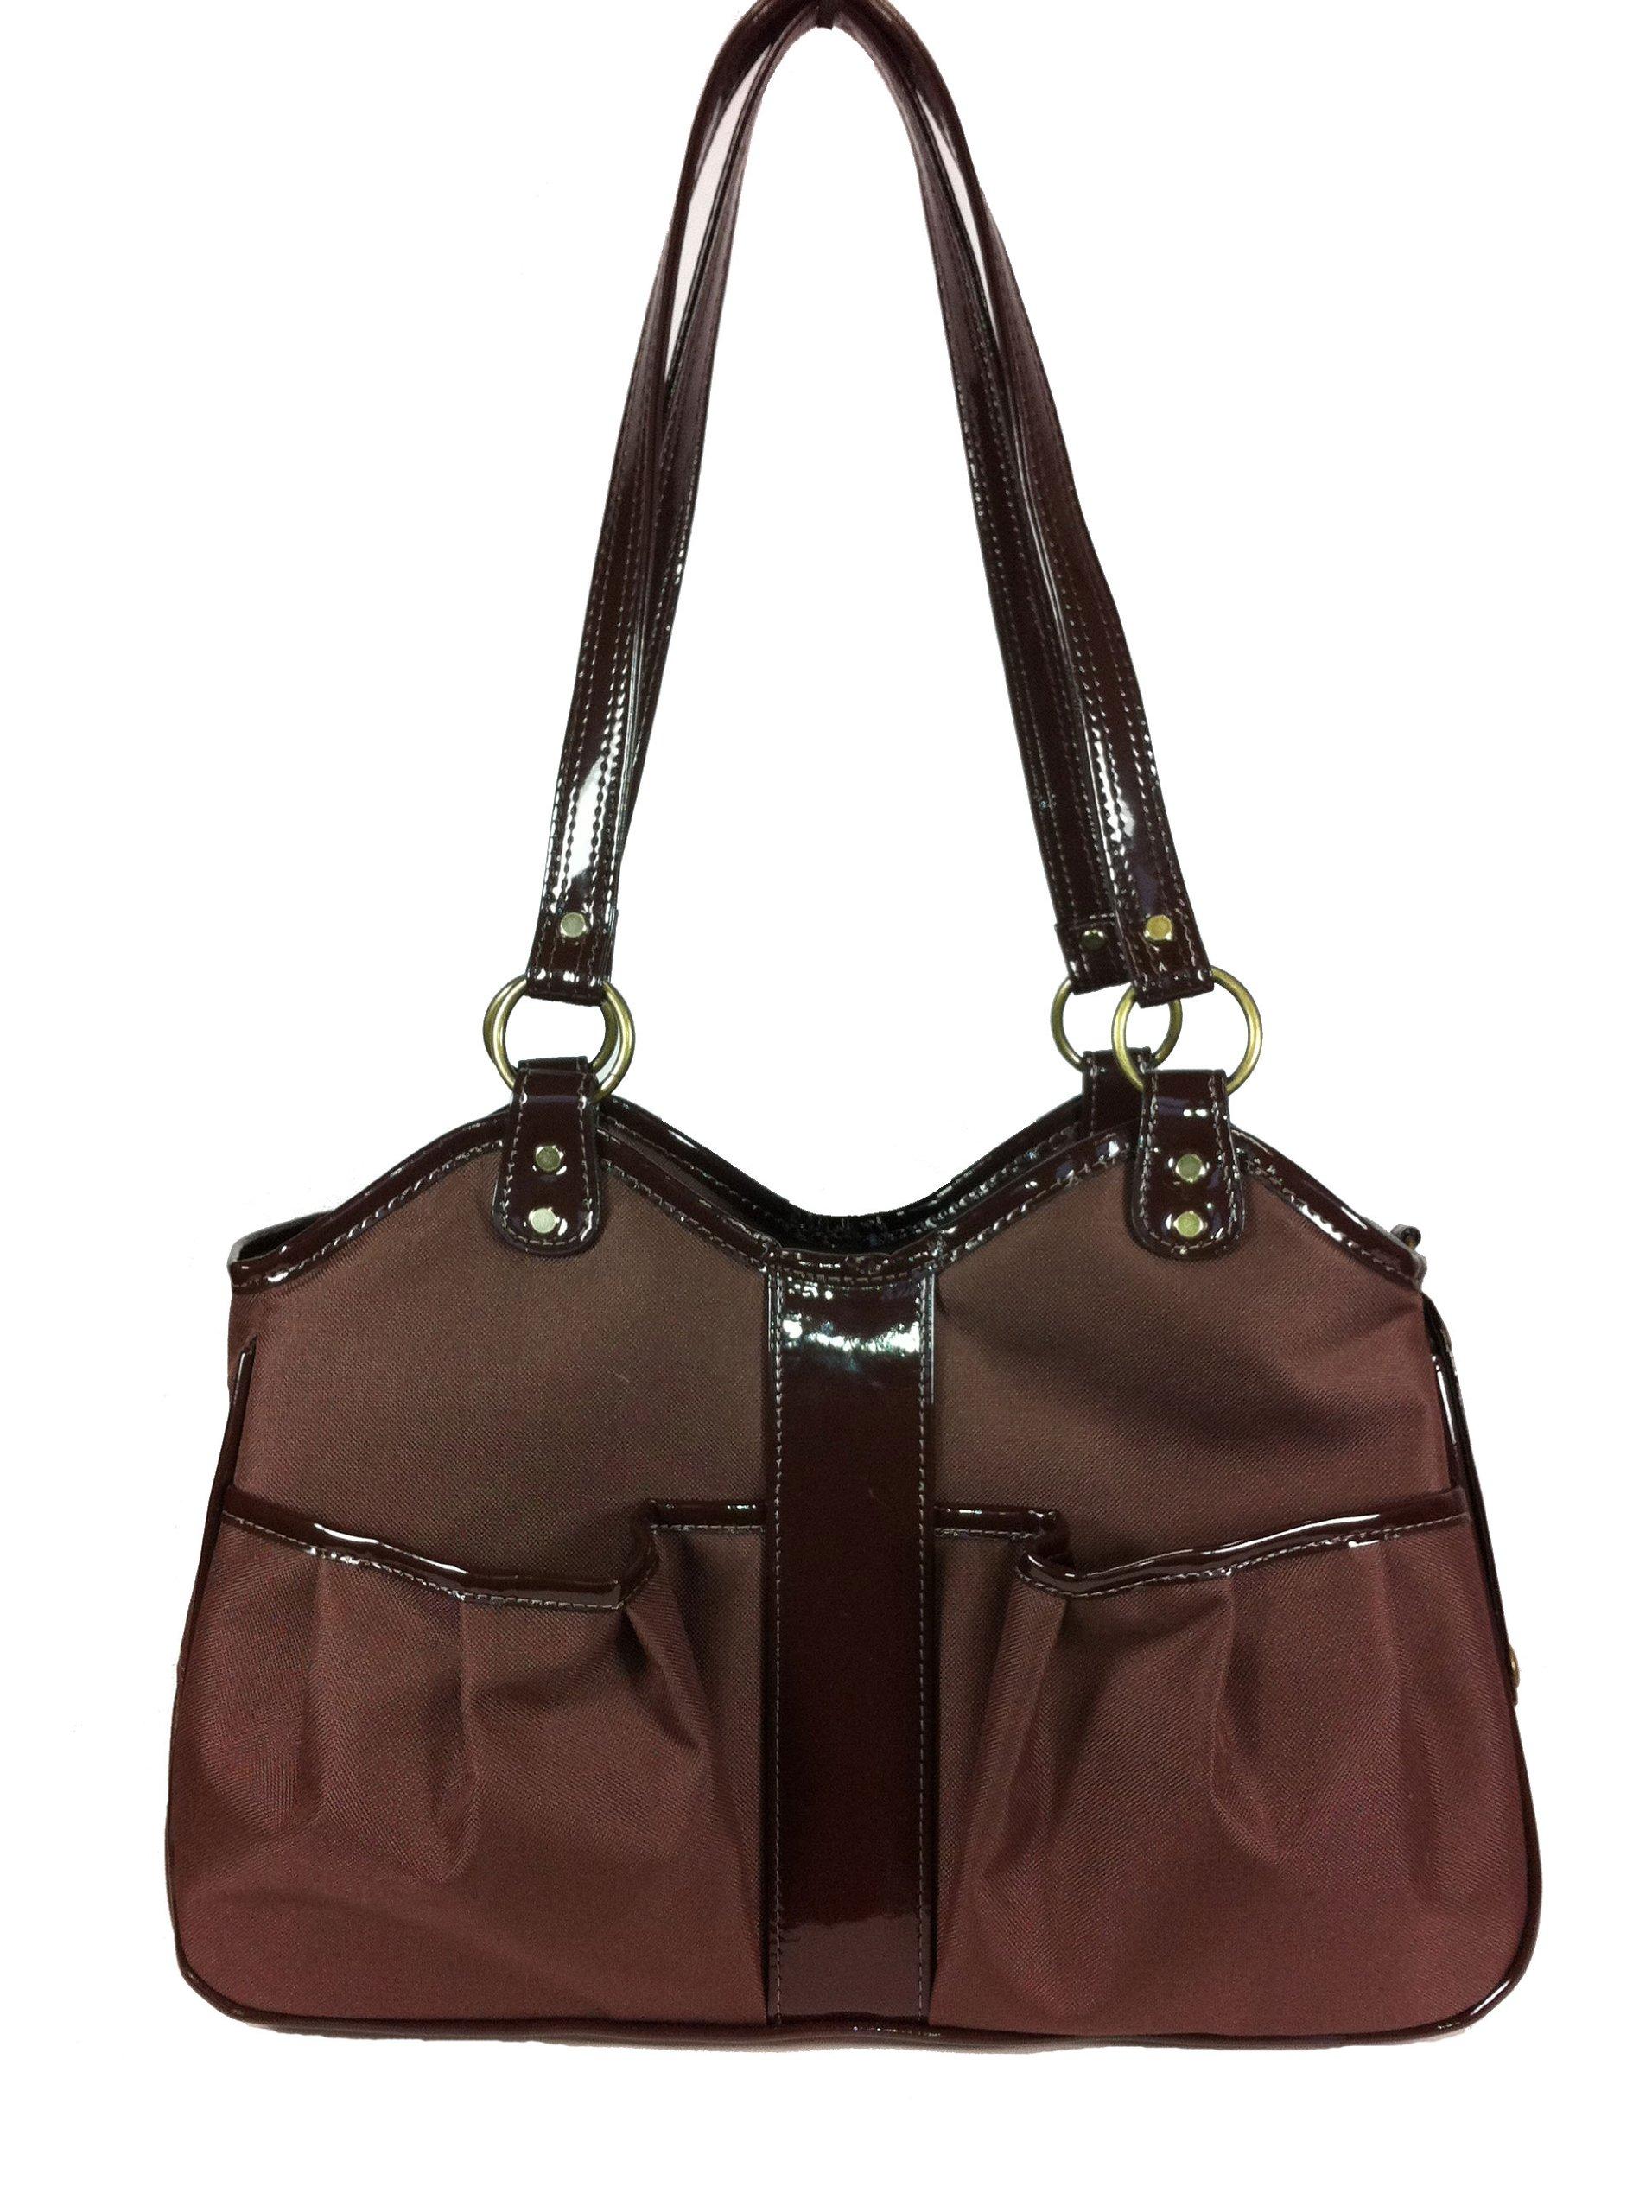 Petote Metro Classic Pet Carrier Bag, Large, Chocolate